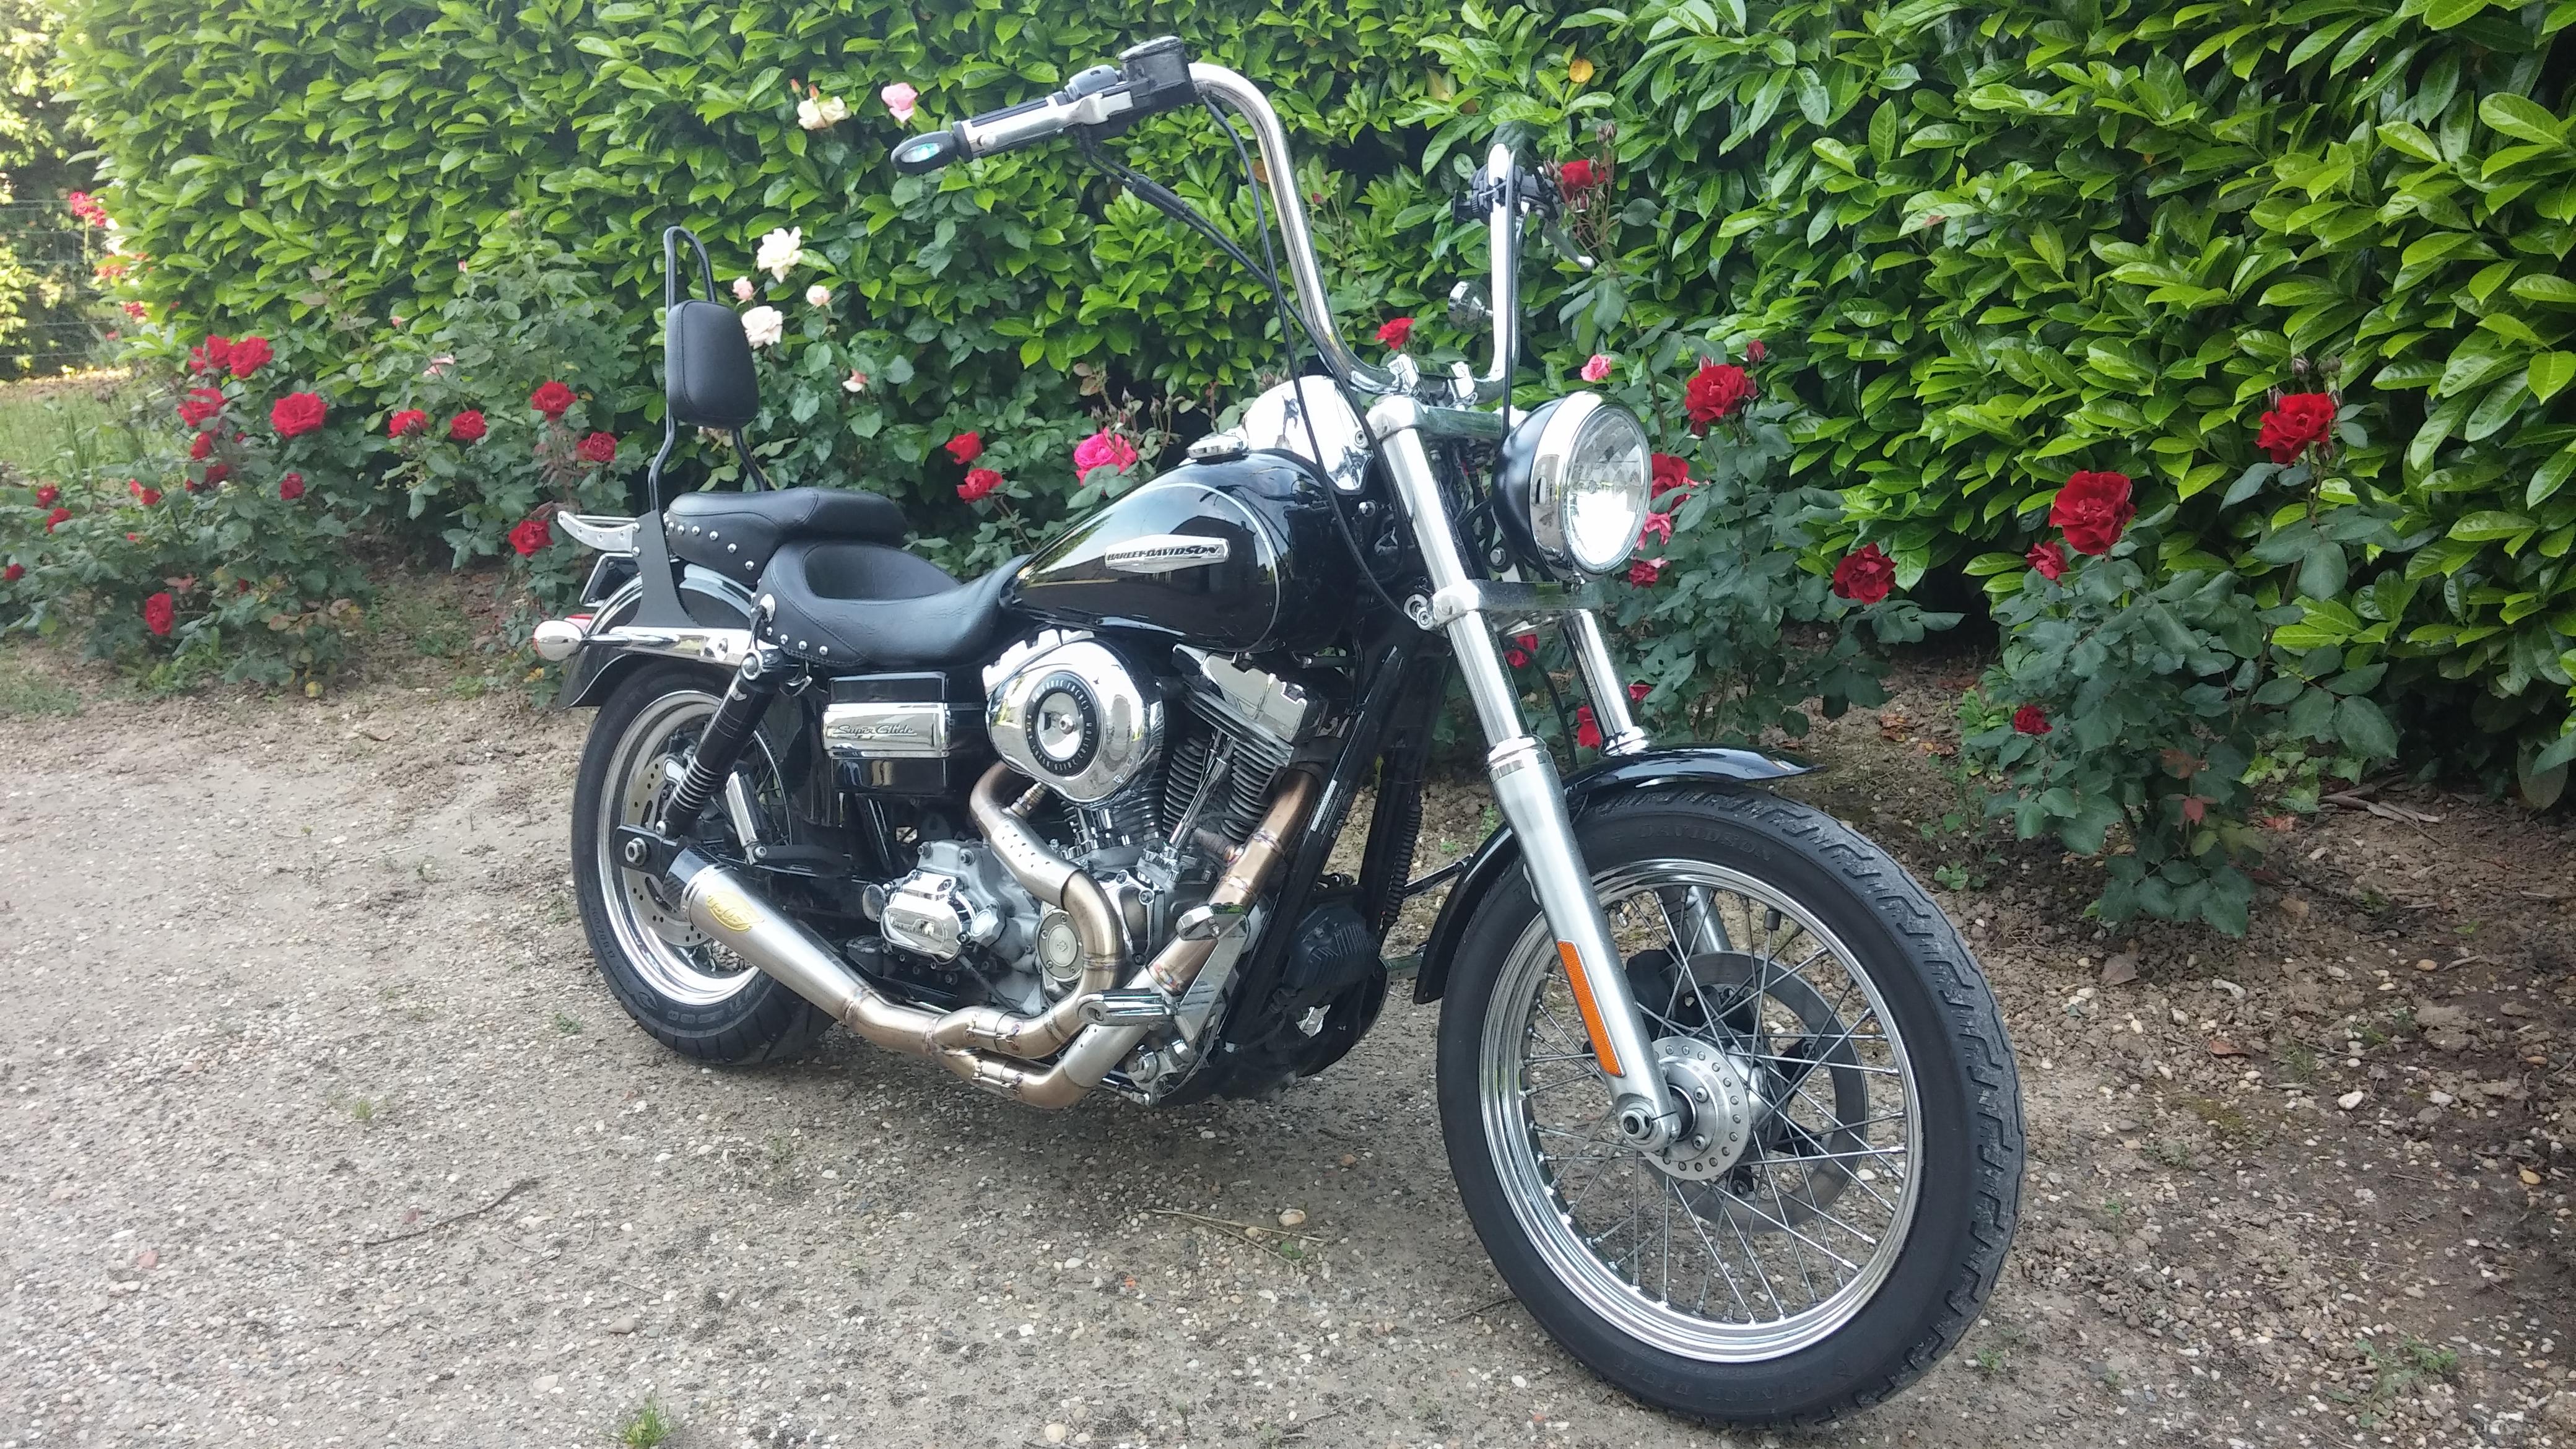 DYNA SUPER GLIDE  combien sommes nous sur Passion-Harley - Page 5 51865220160527185544